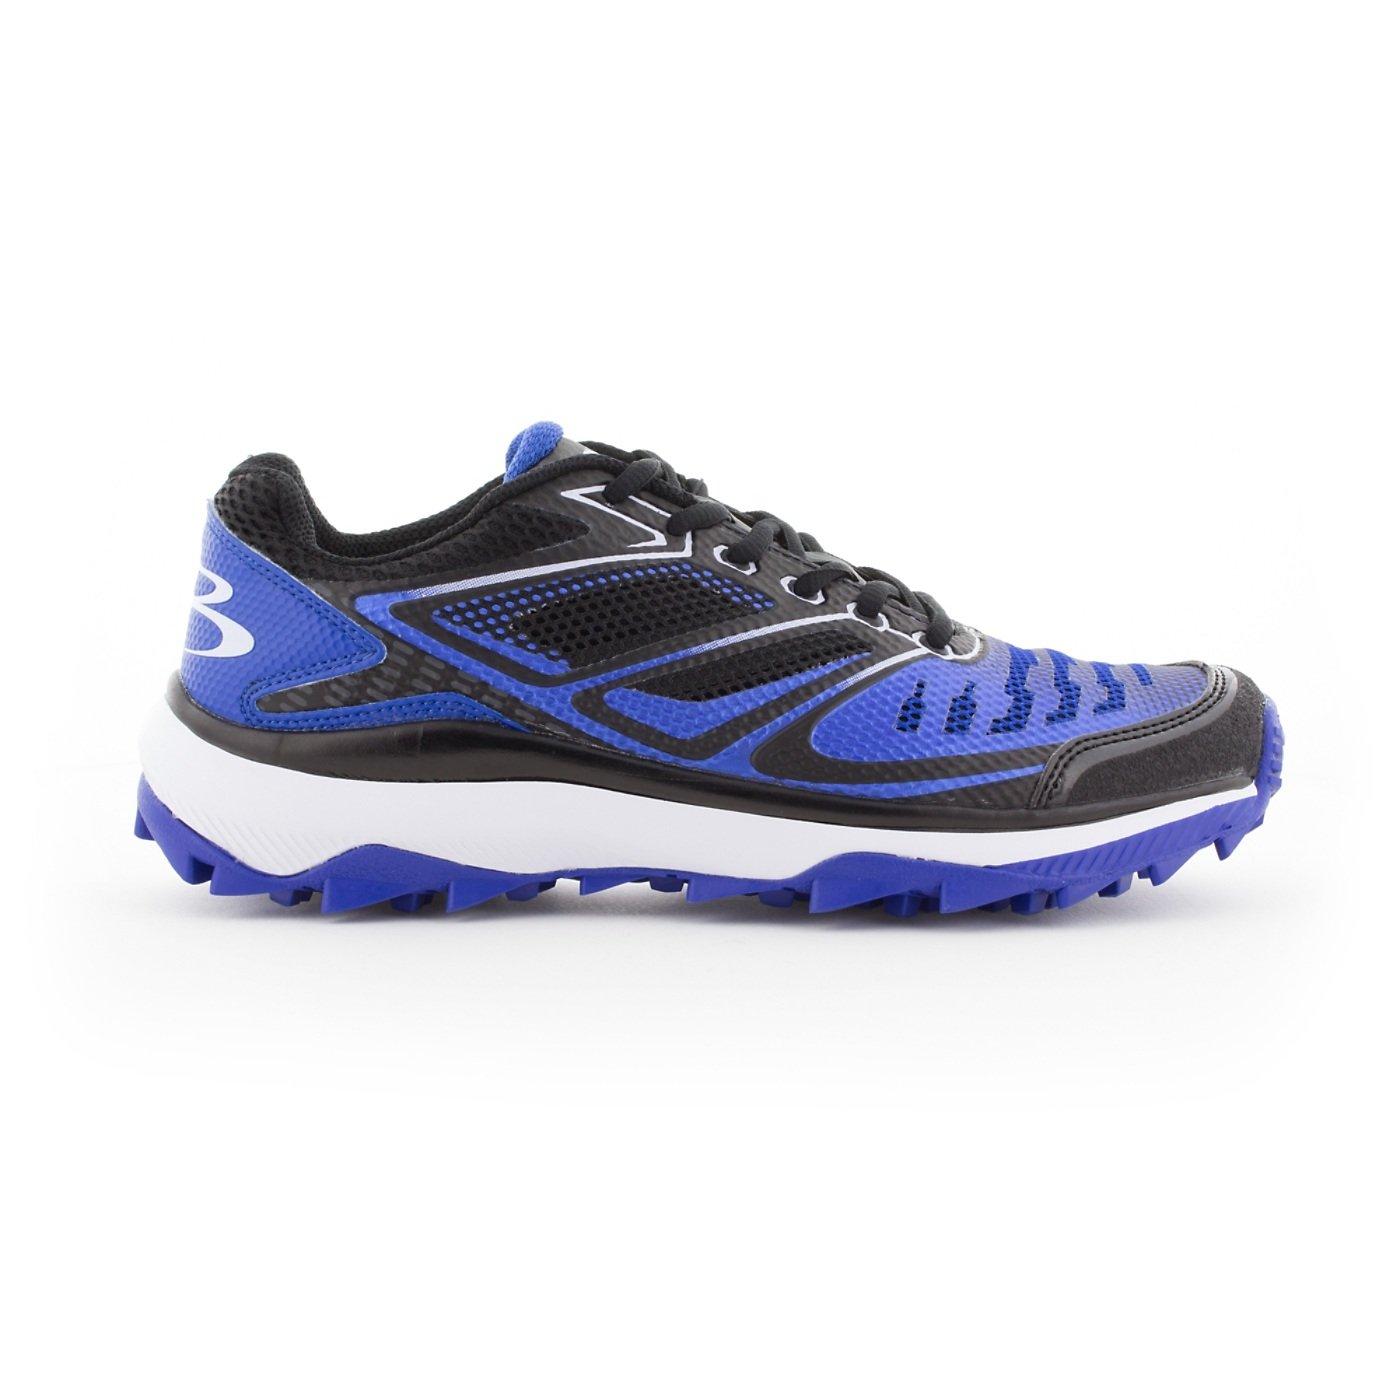 BoombahメンズTurbine Turf Shoes – 20カラーオプション – 複数のサイズ B076JQDFXB 12|ブラック/ロイヤル(royal) ブラック/ロイヤル(royal) 12